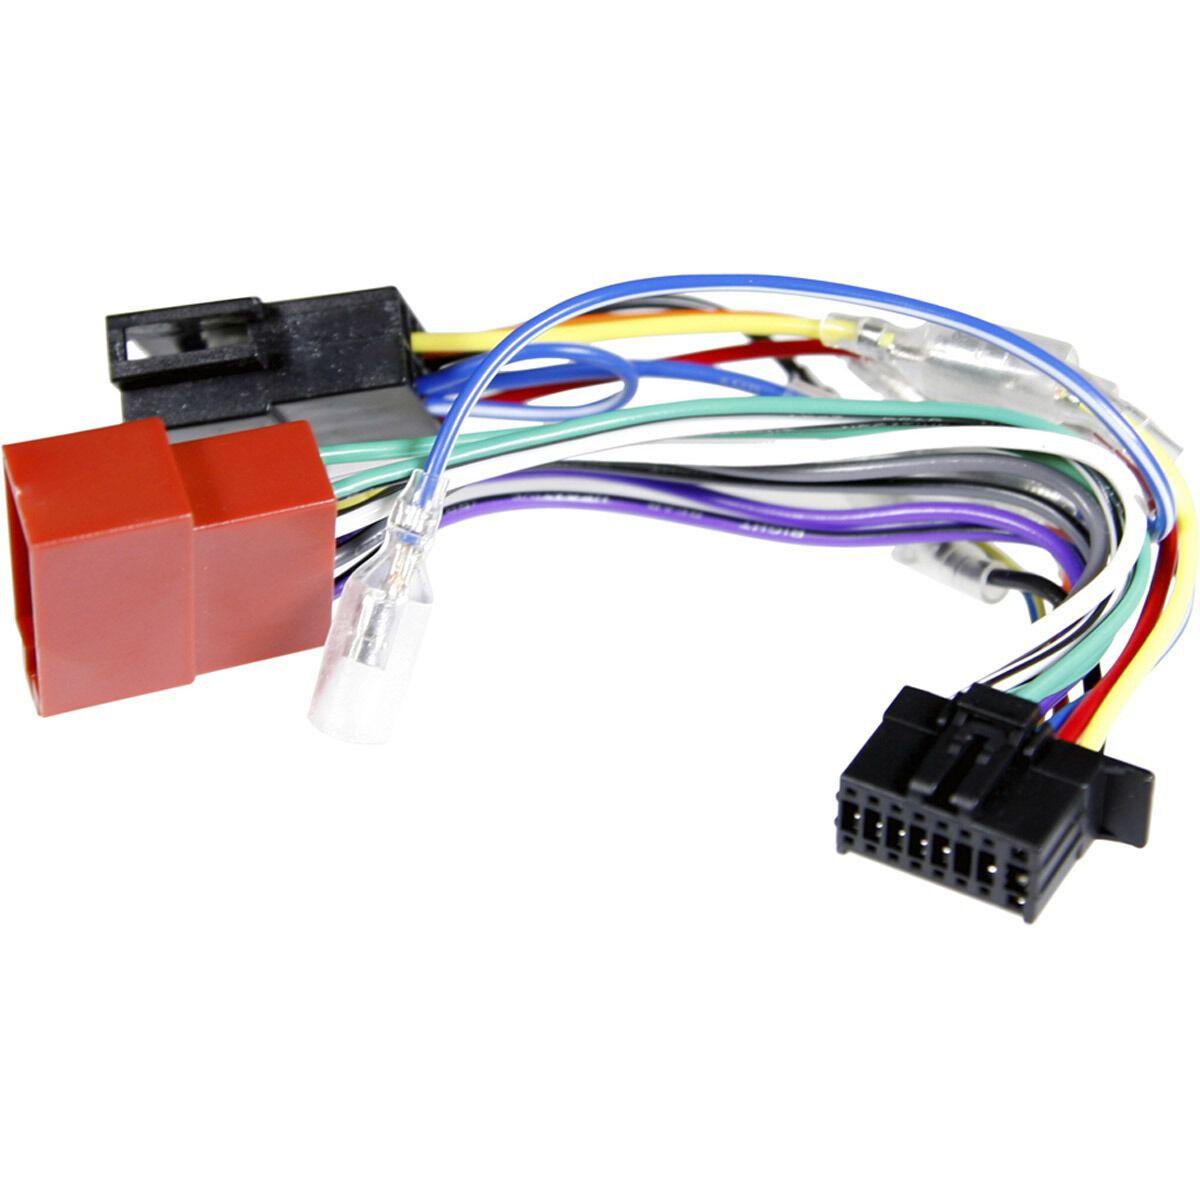 wiring harness jvc 16 pin supercheap auto new zealand rh supercheapauto co nz jvc wiring harness diagram jvc wiring harness adapter